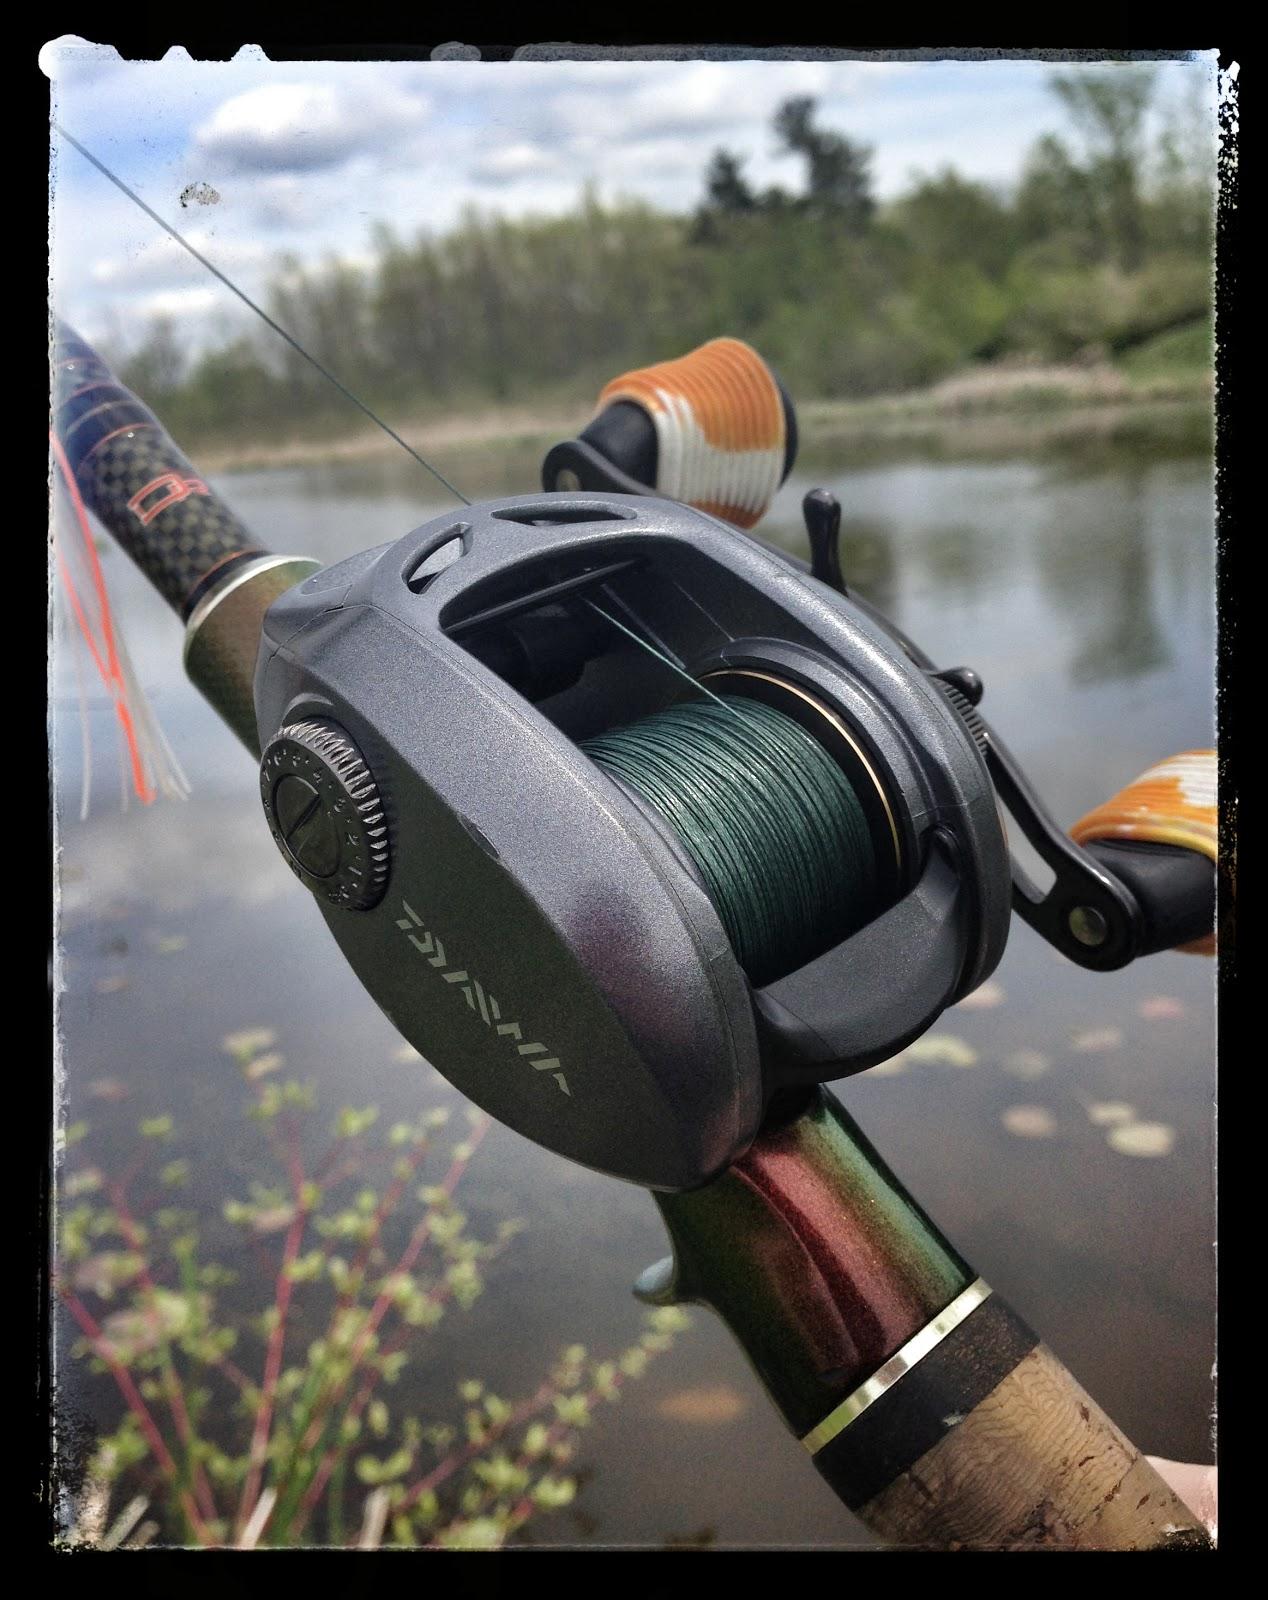 Bass junkies fishing addiction test drive daiwa lexa for Best fishing line for bass baitcaster